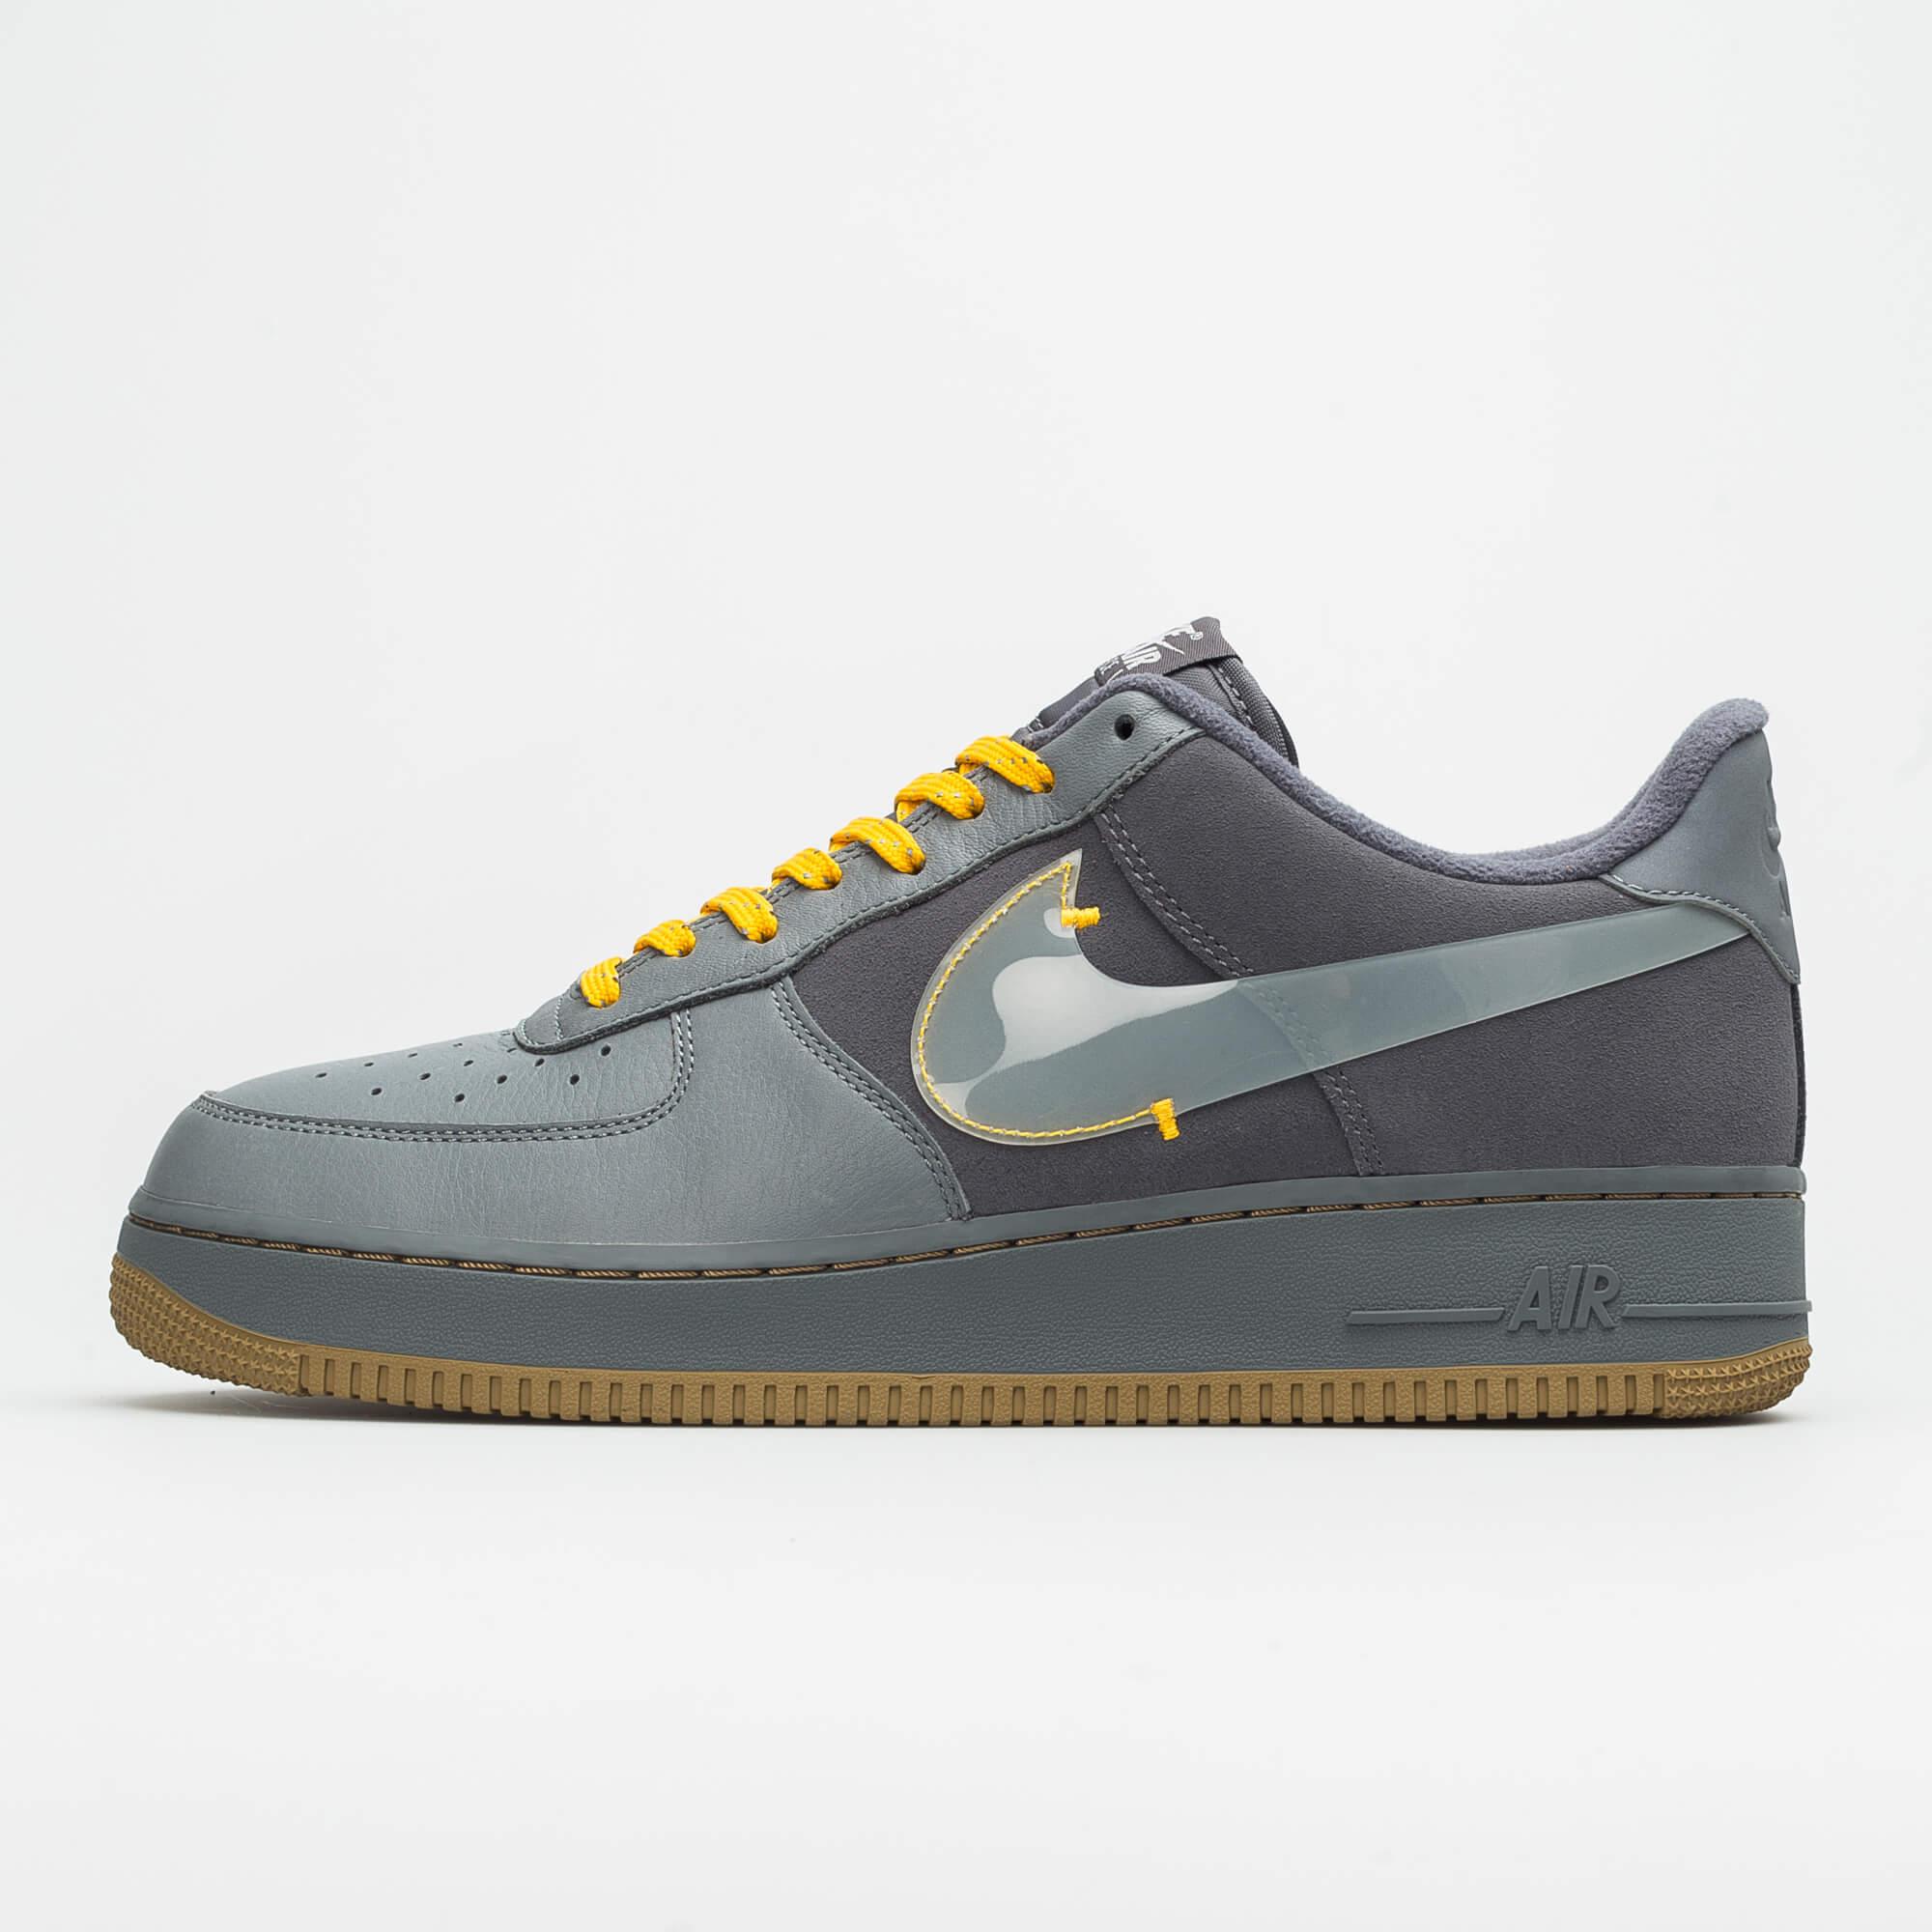 Scarpa da ginnastica uomo Nike Air Force 1 PRM cq6367 001   eBay